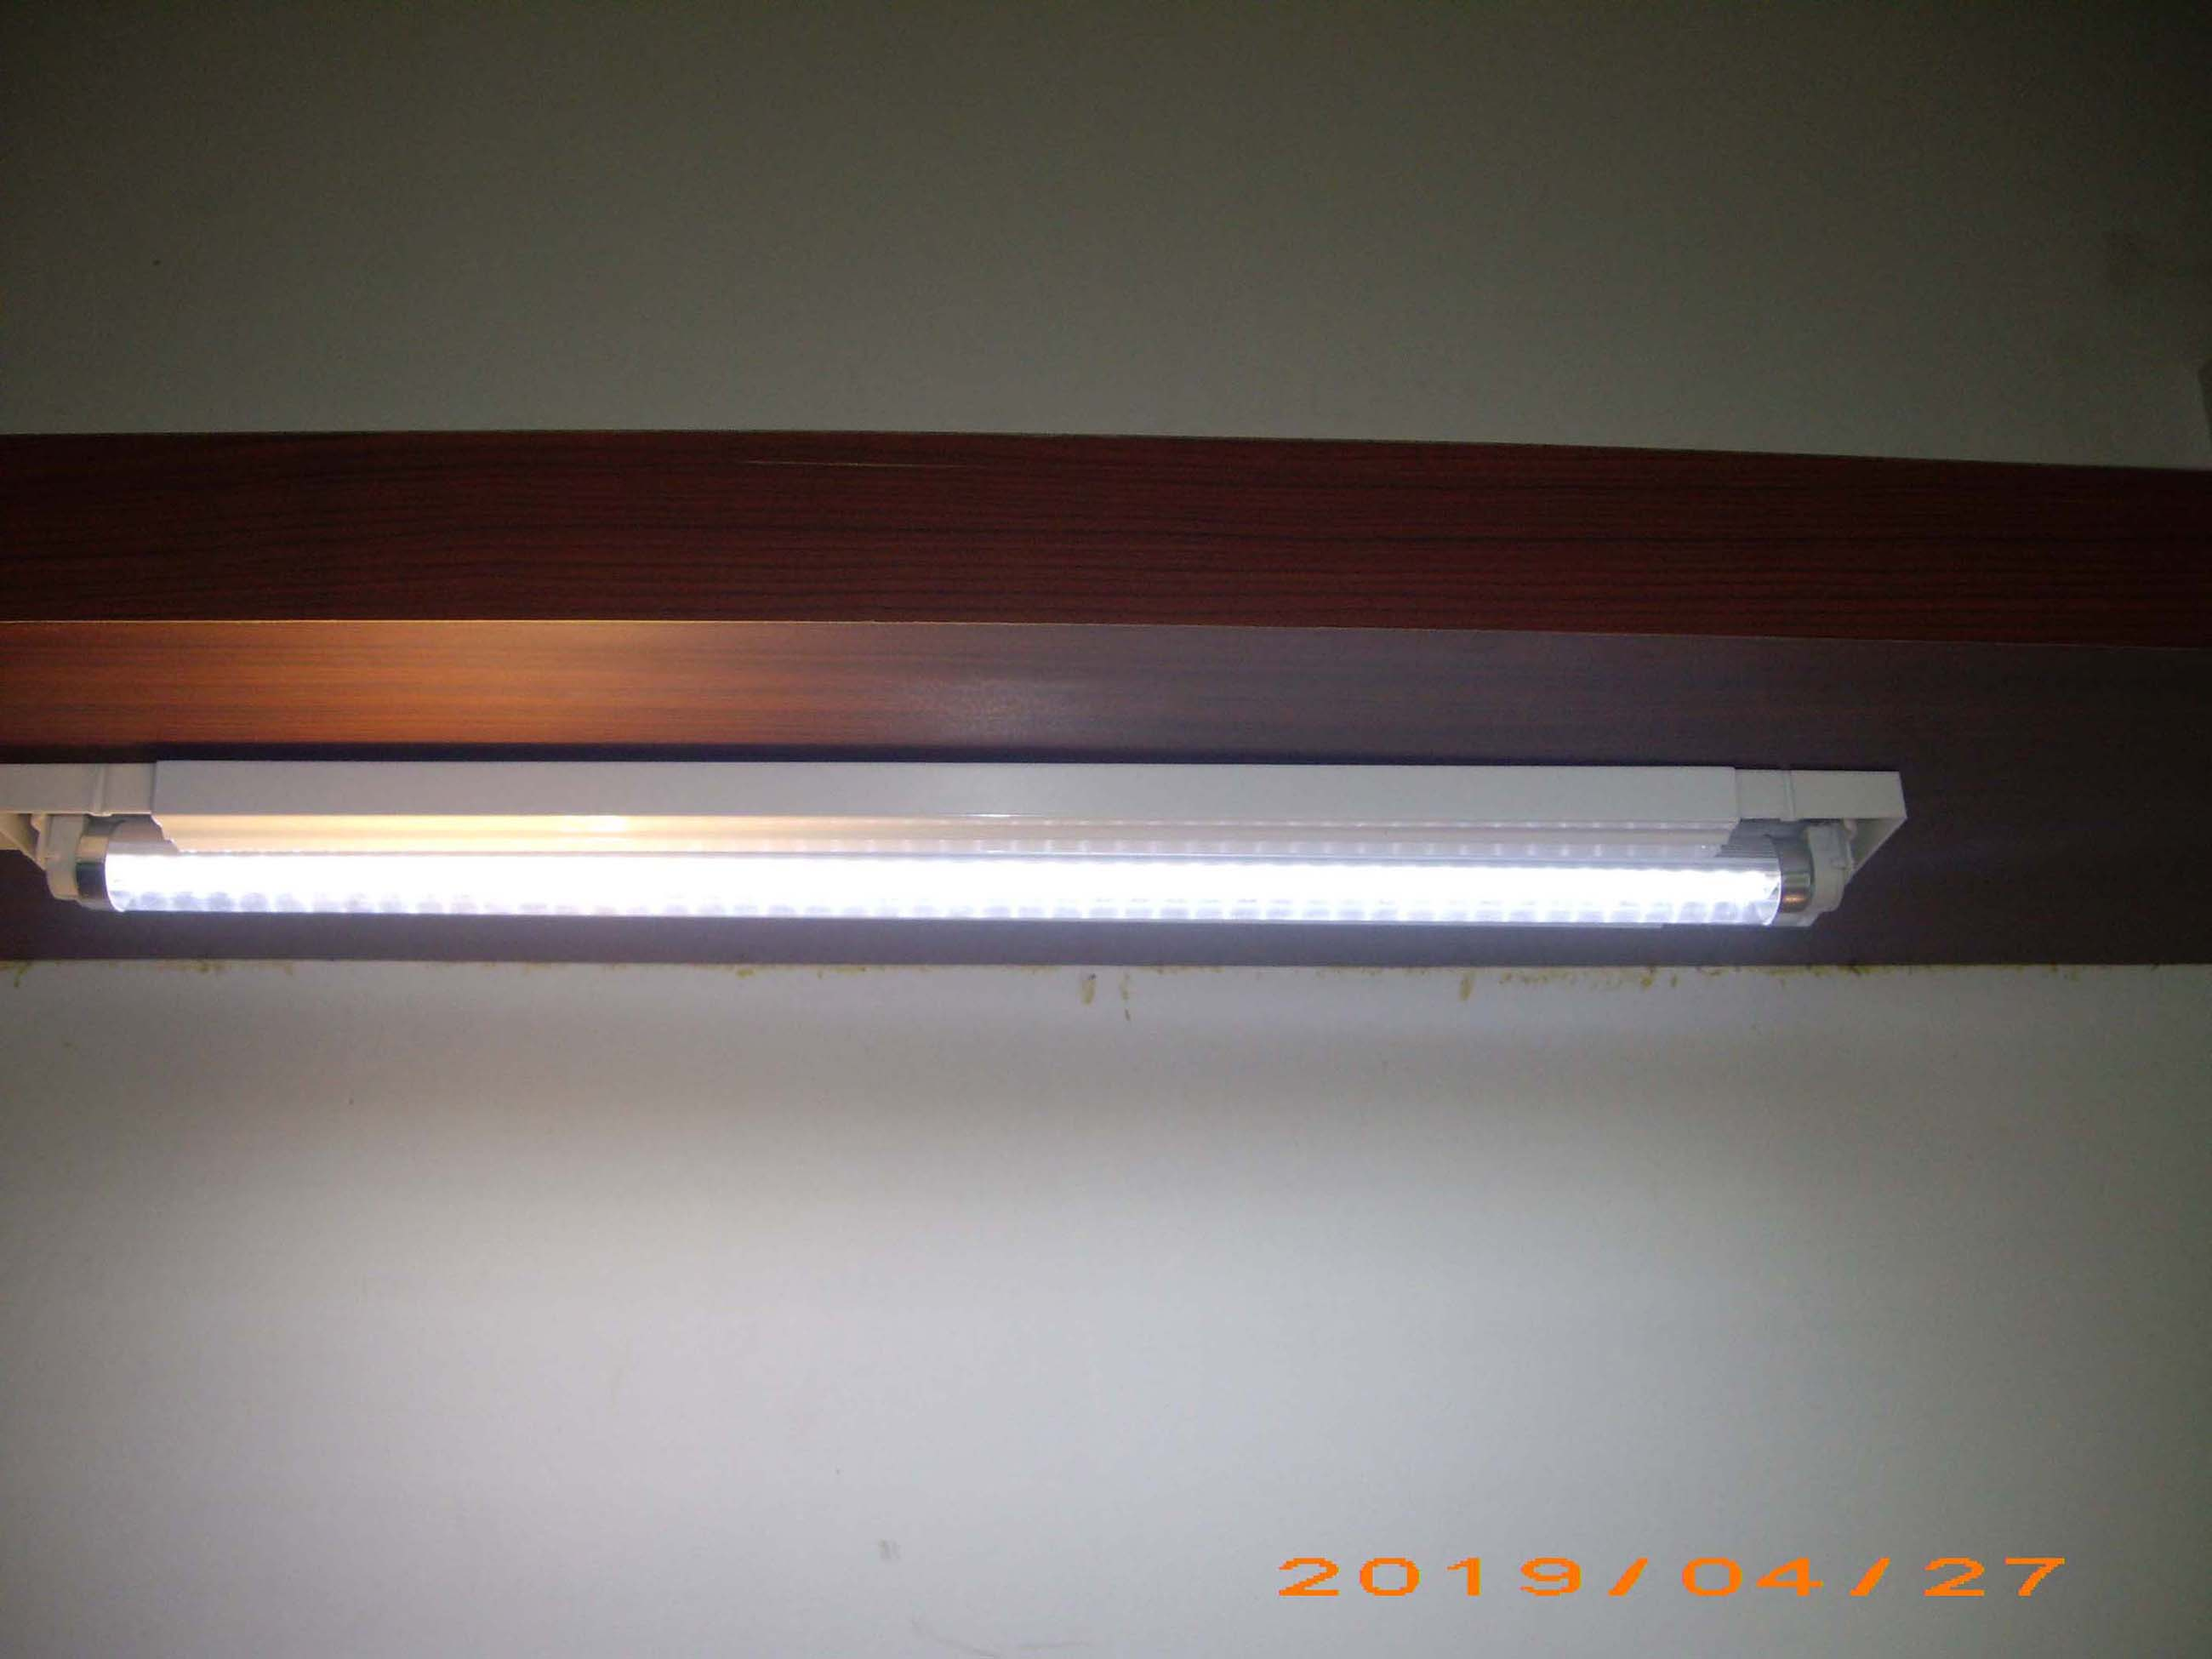 供应led日光灯管led节能灯图片